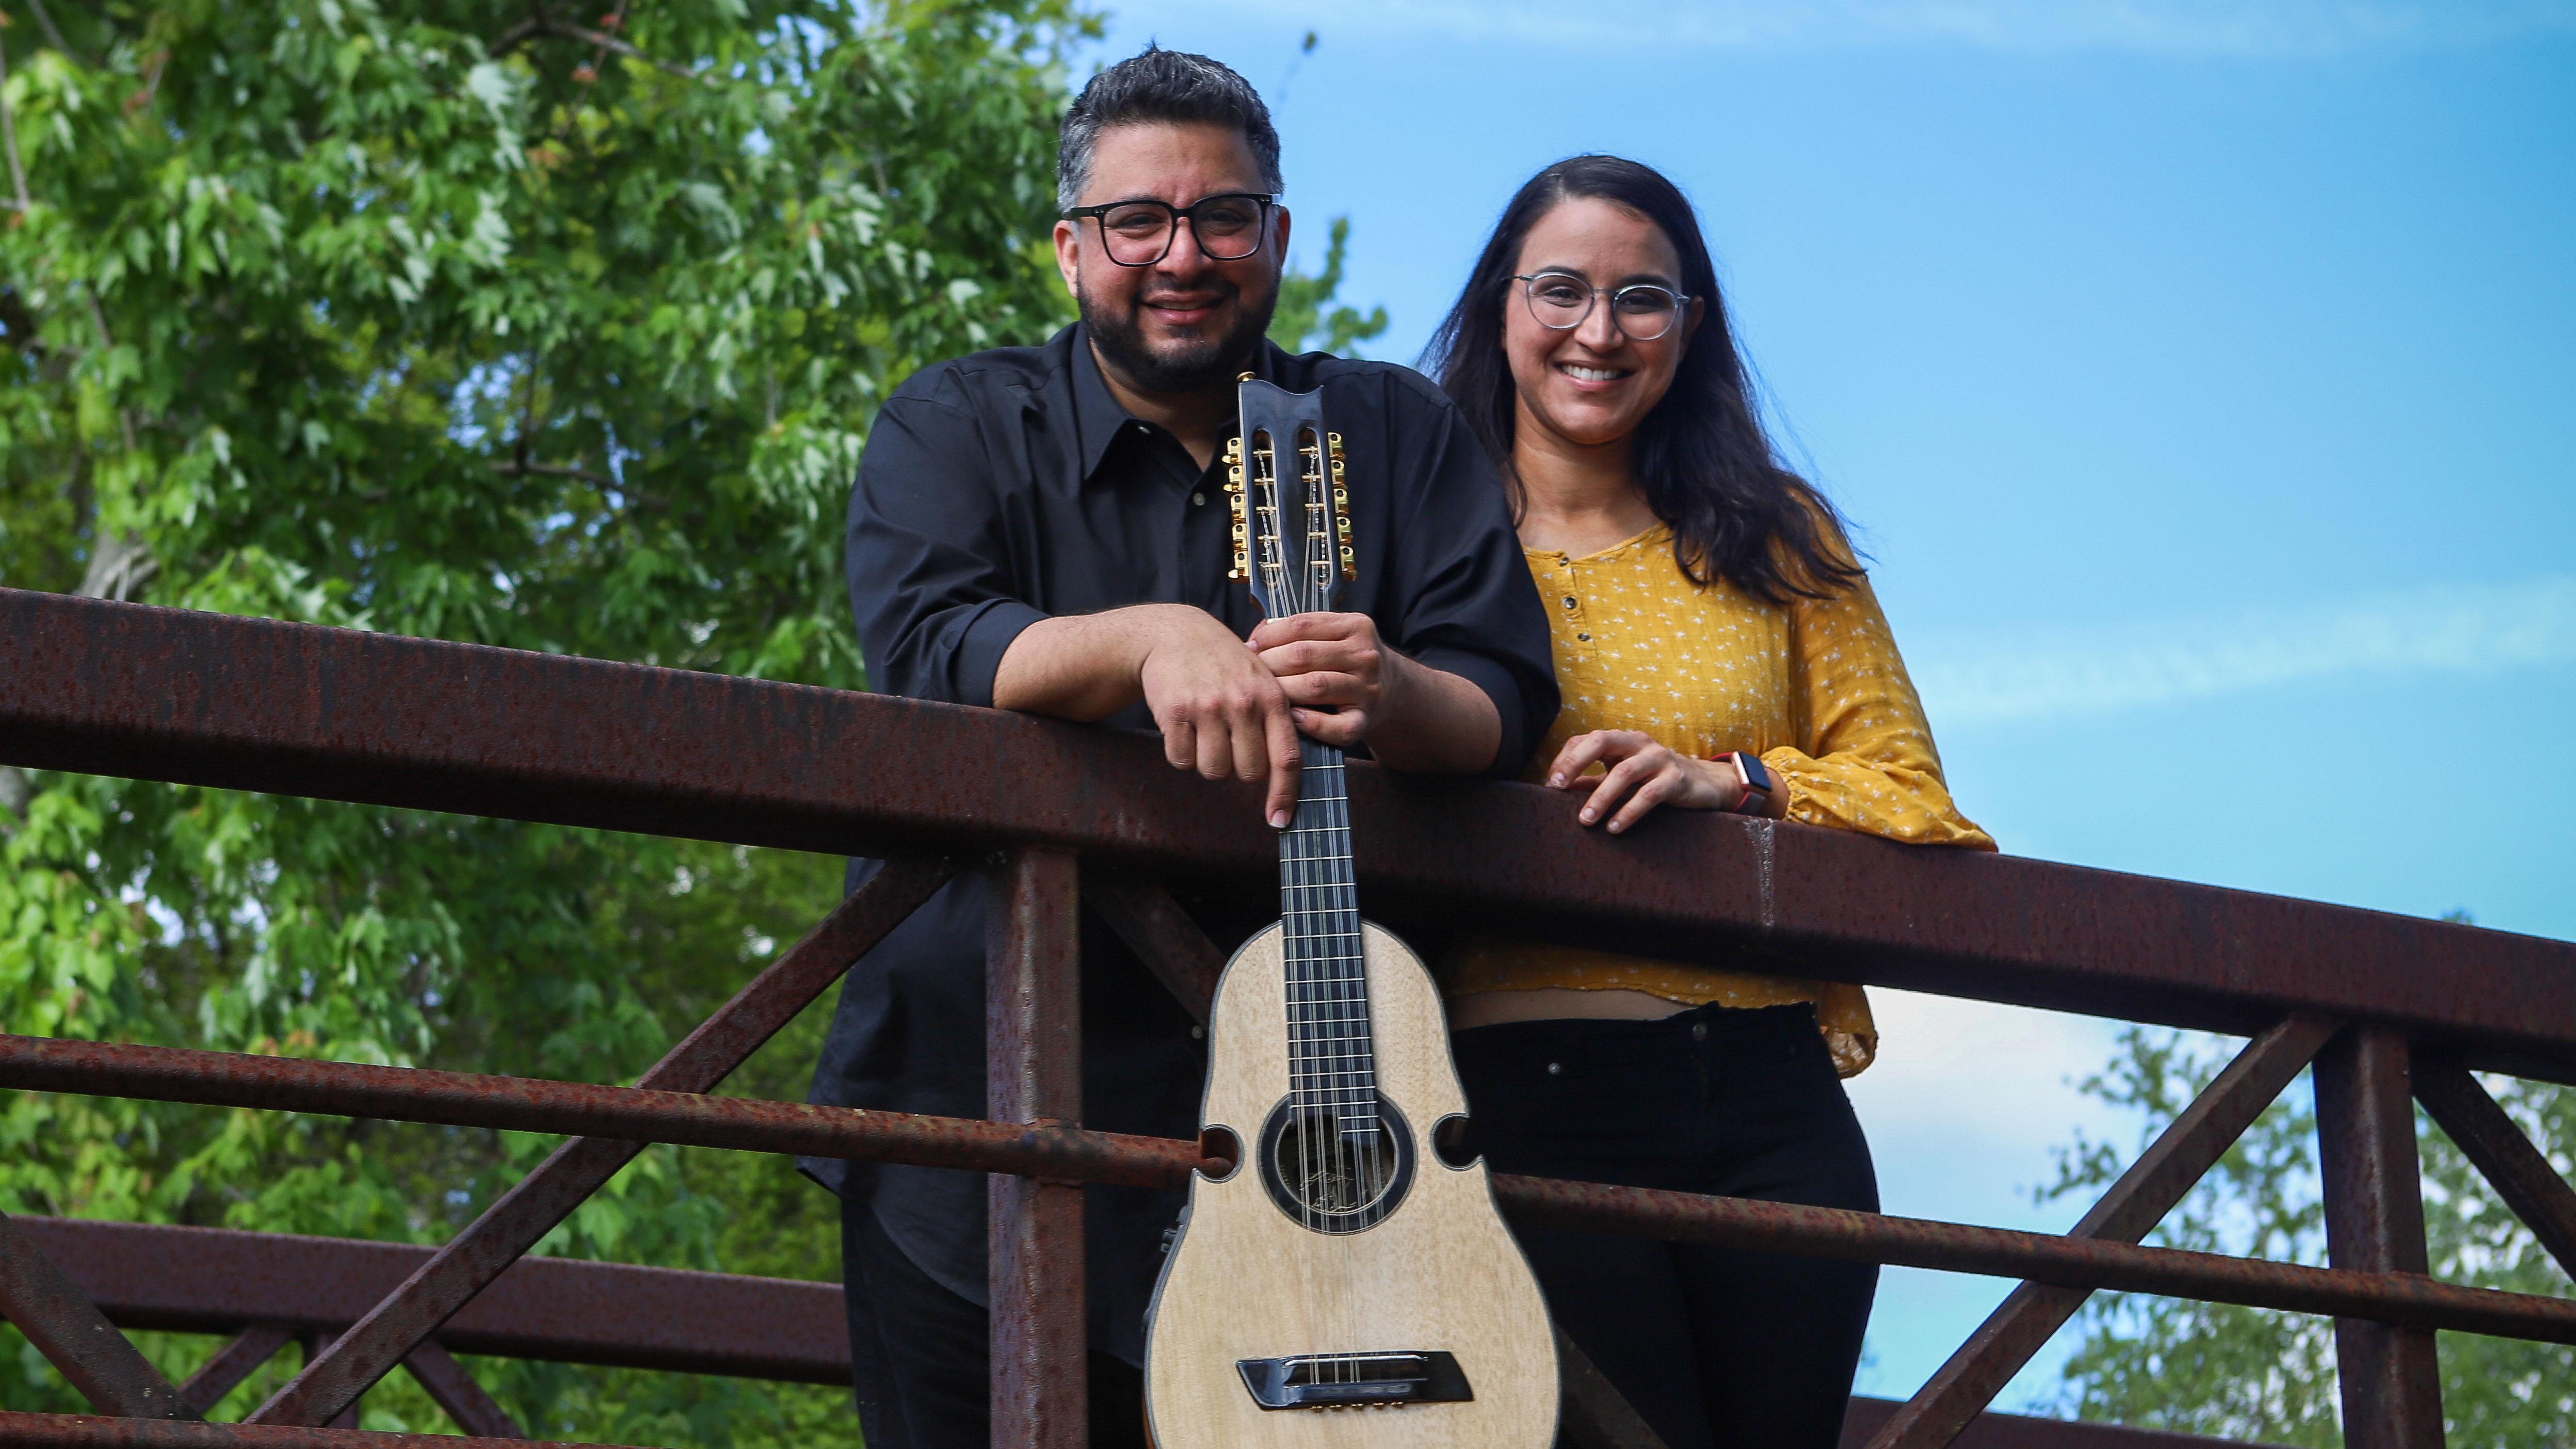 Boricuas rinden tributo a Juan Luis Guerra en Orlando